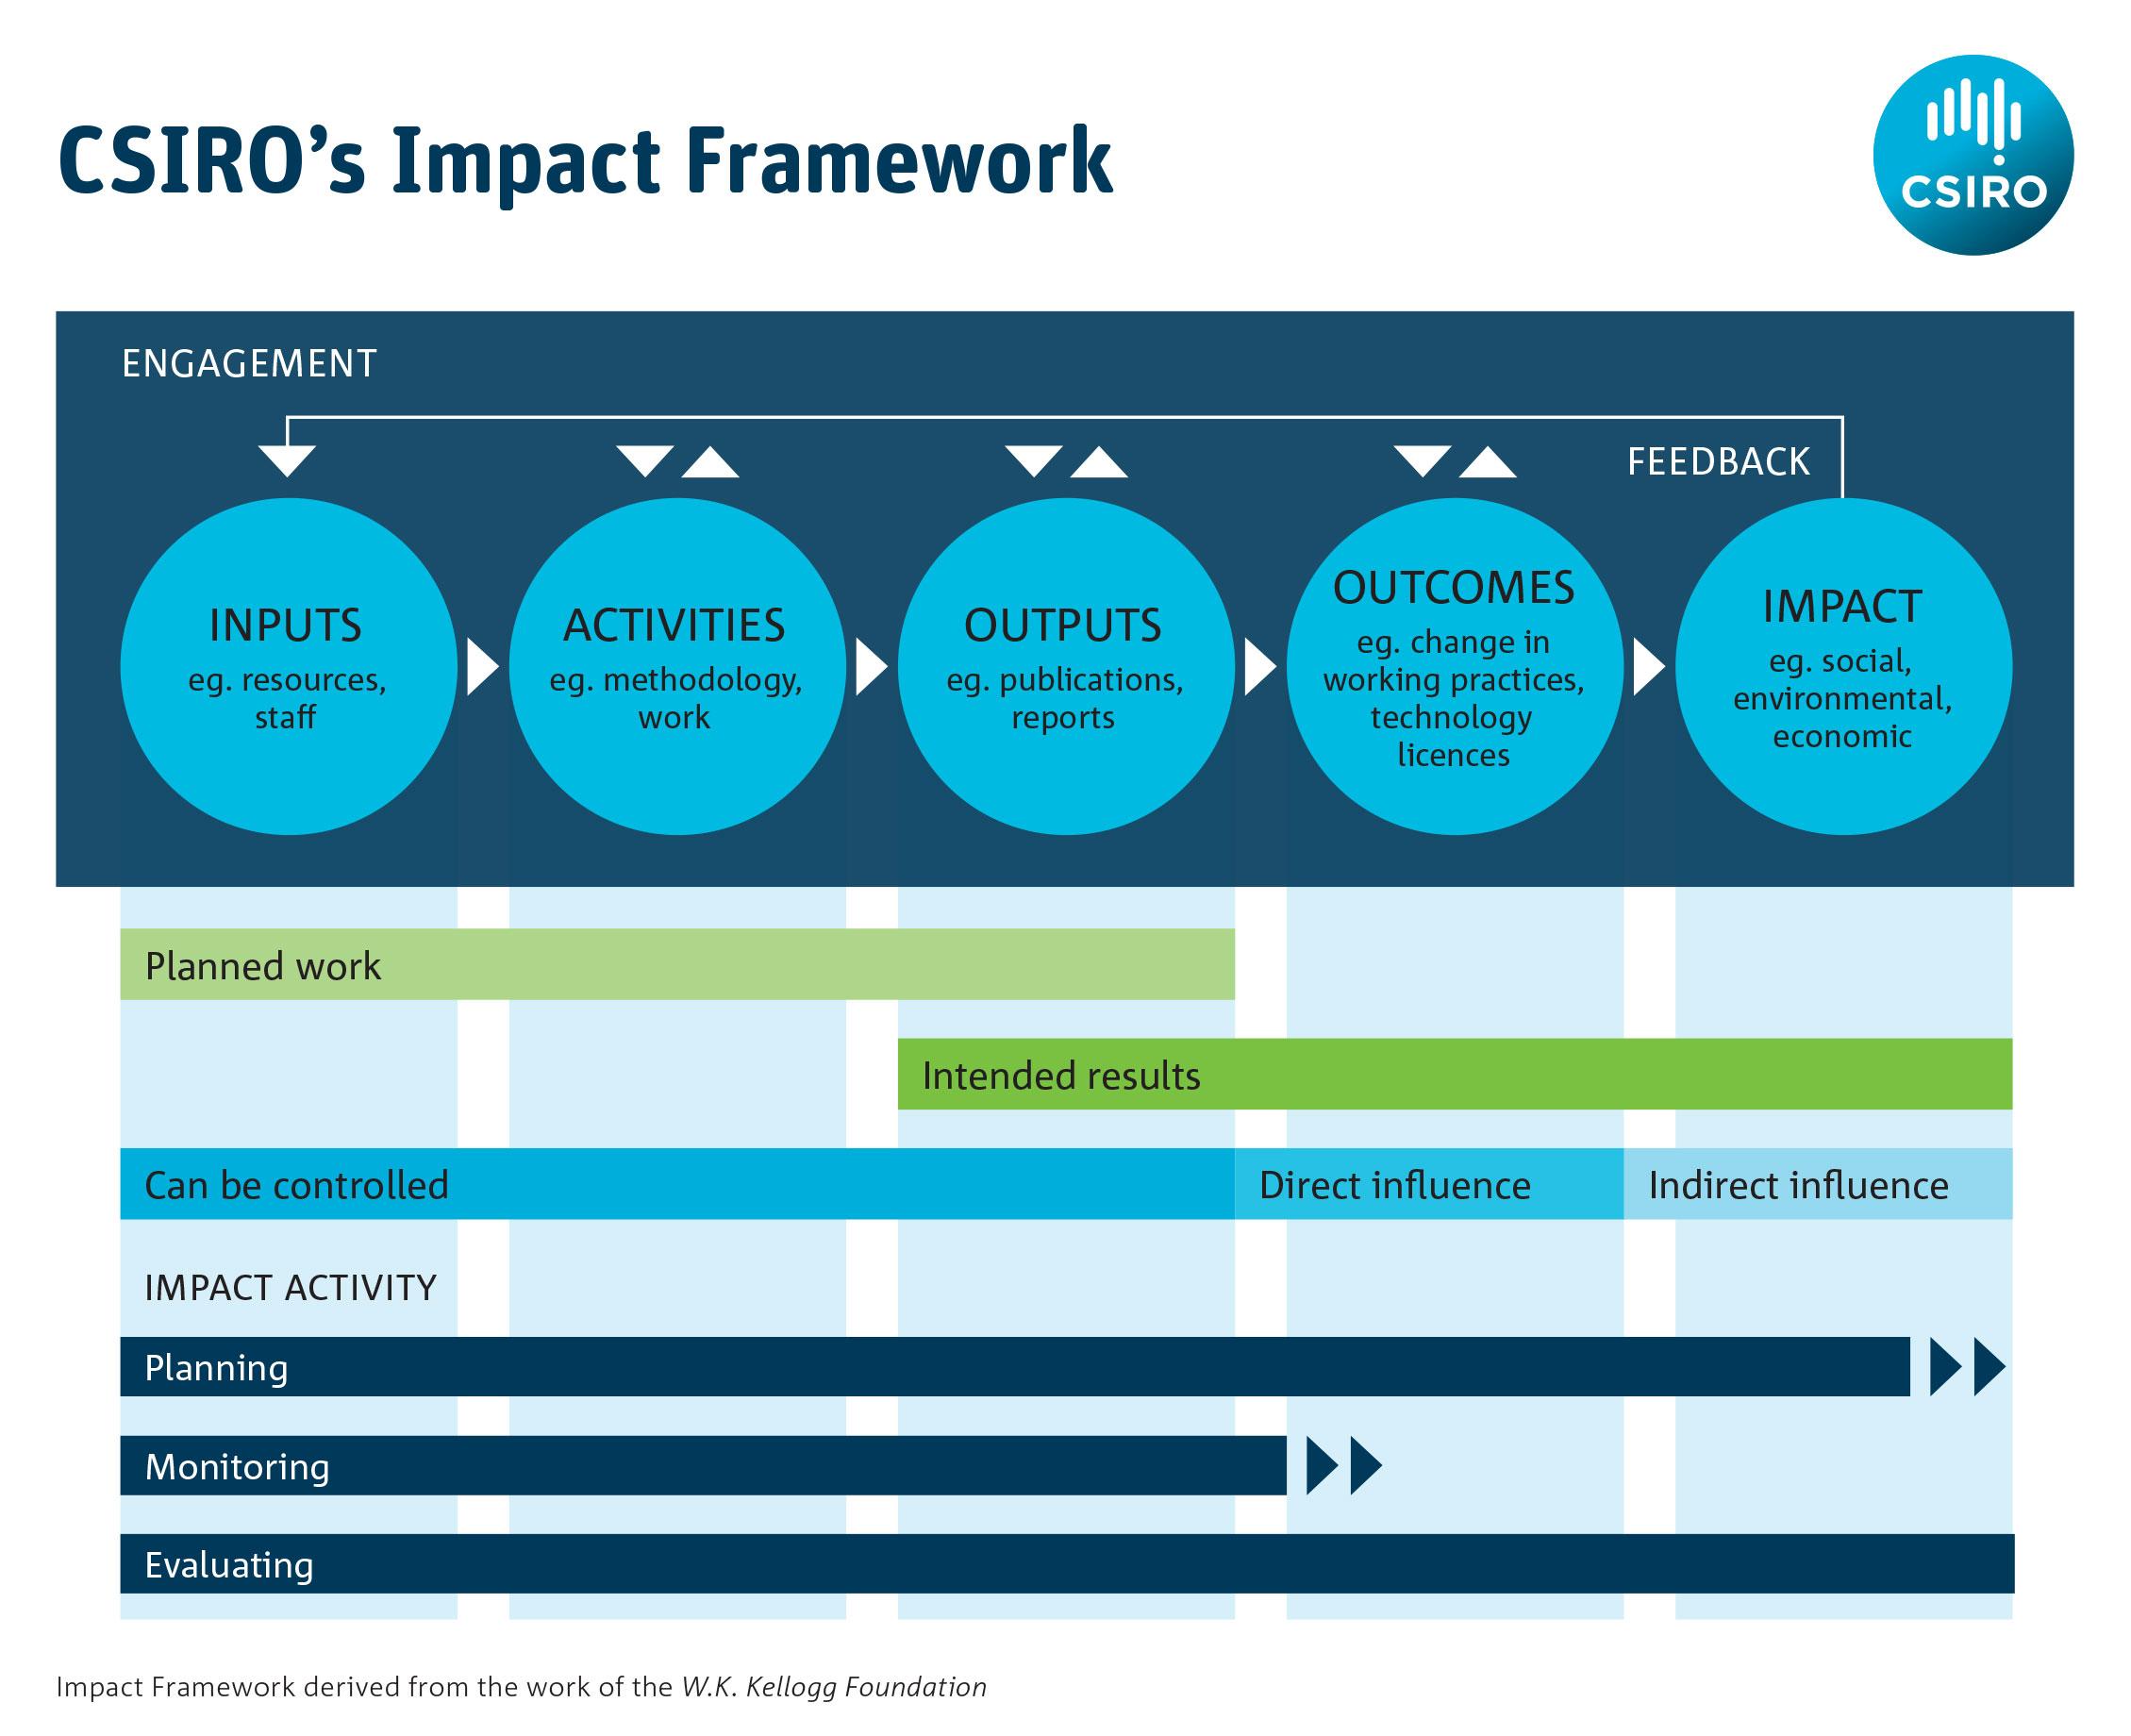 https://www.csiro.au/-/media/About/Images/Impact-images/Framework.jpg